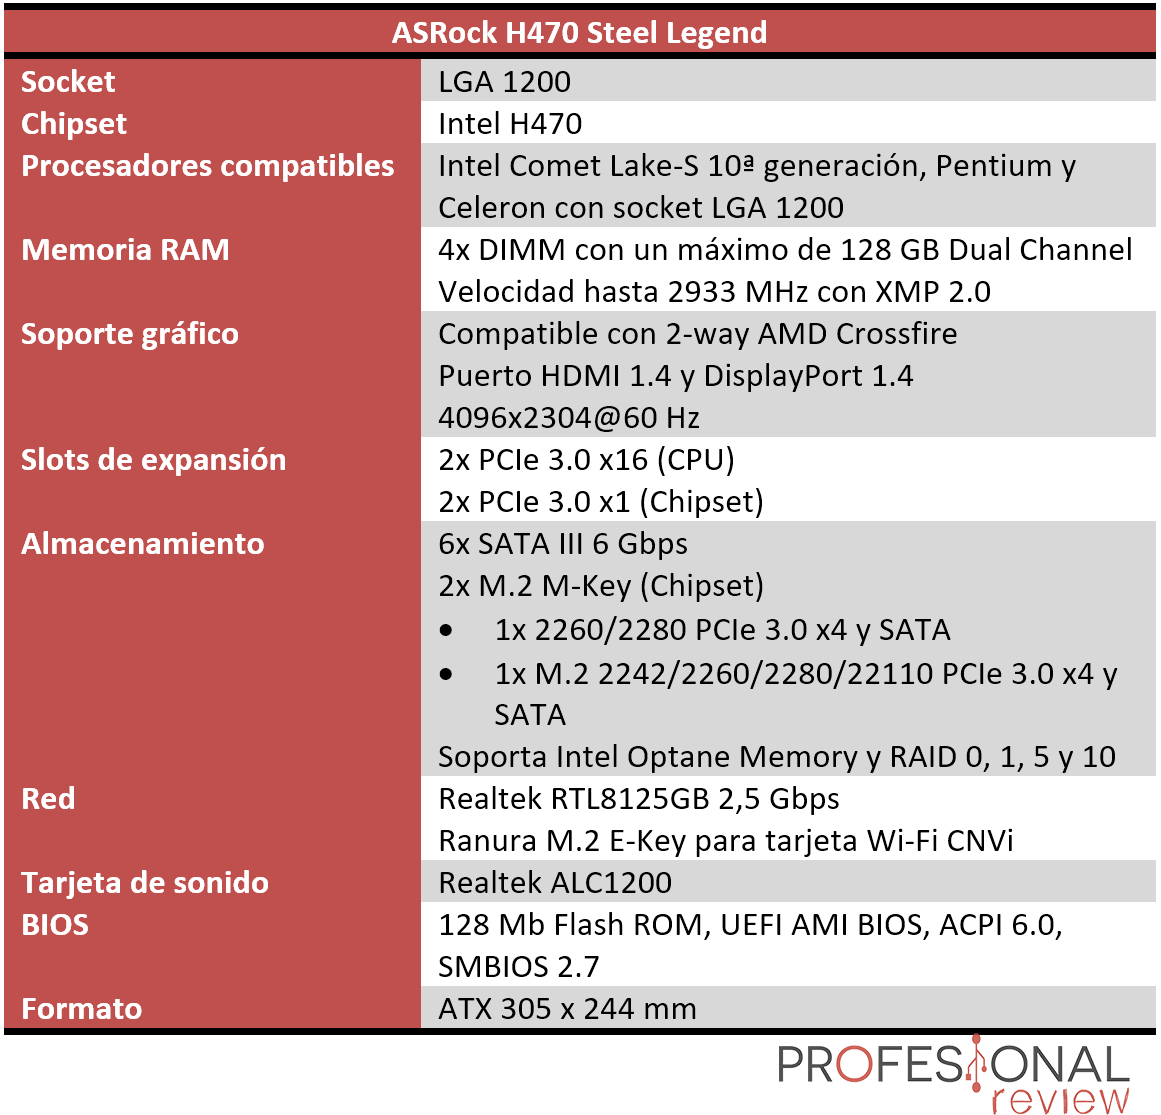 ASRock H470 Steel Legend Características